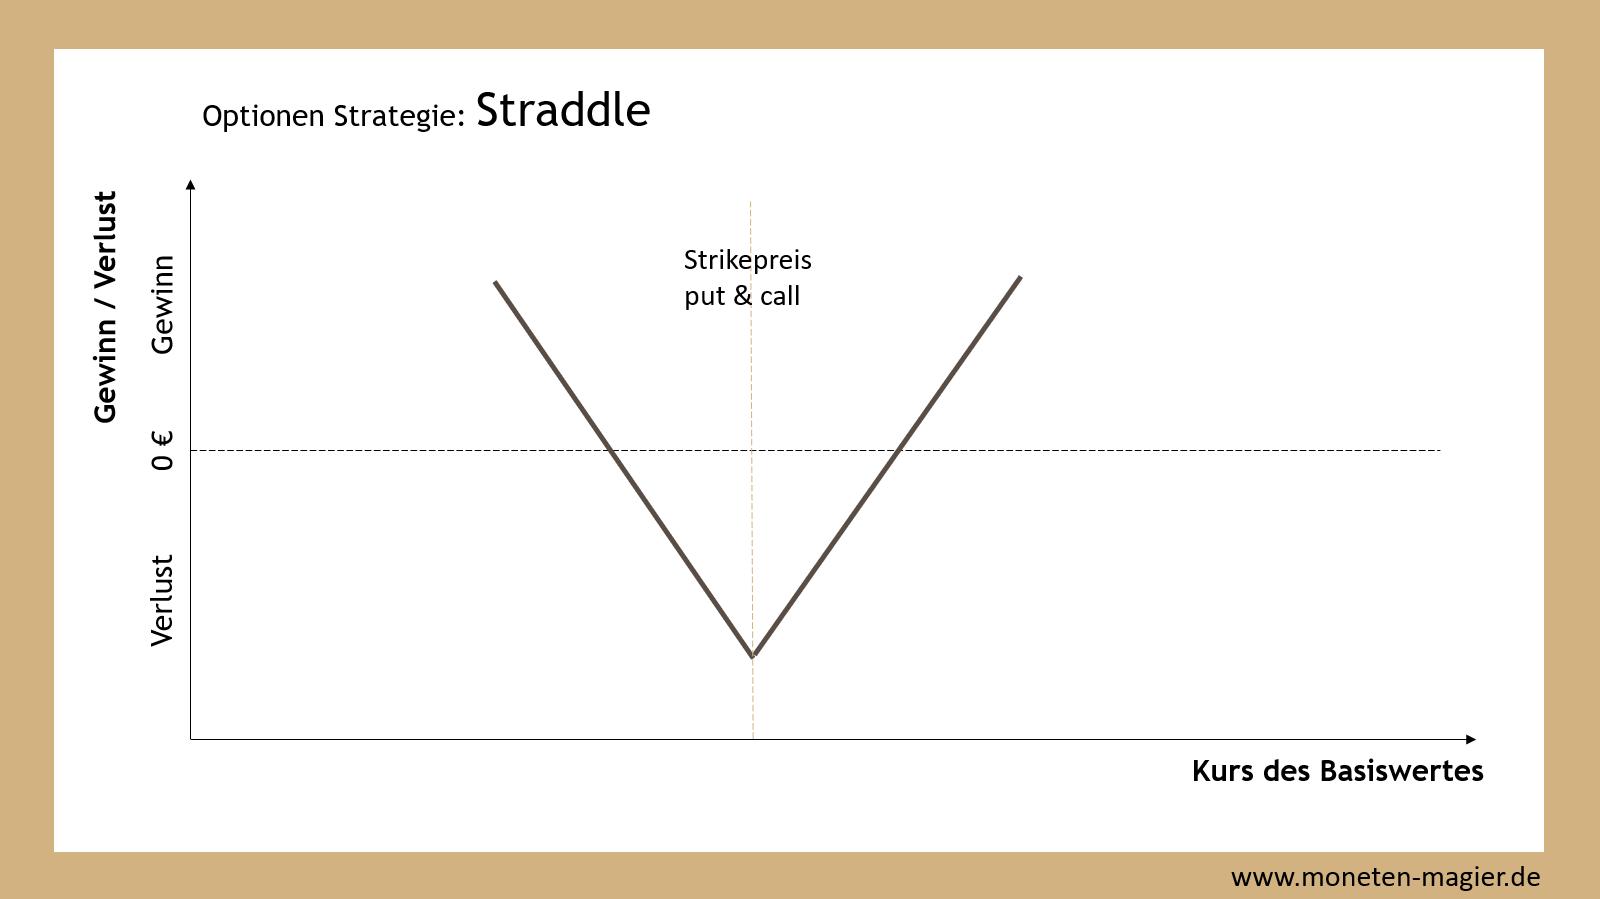 straddle optionen strategie moneten magier